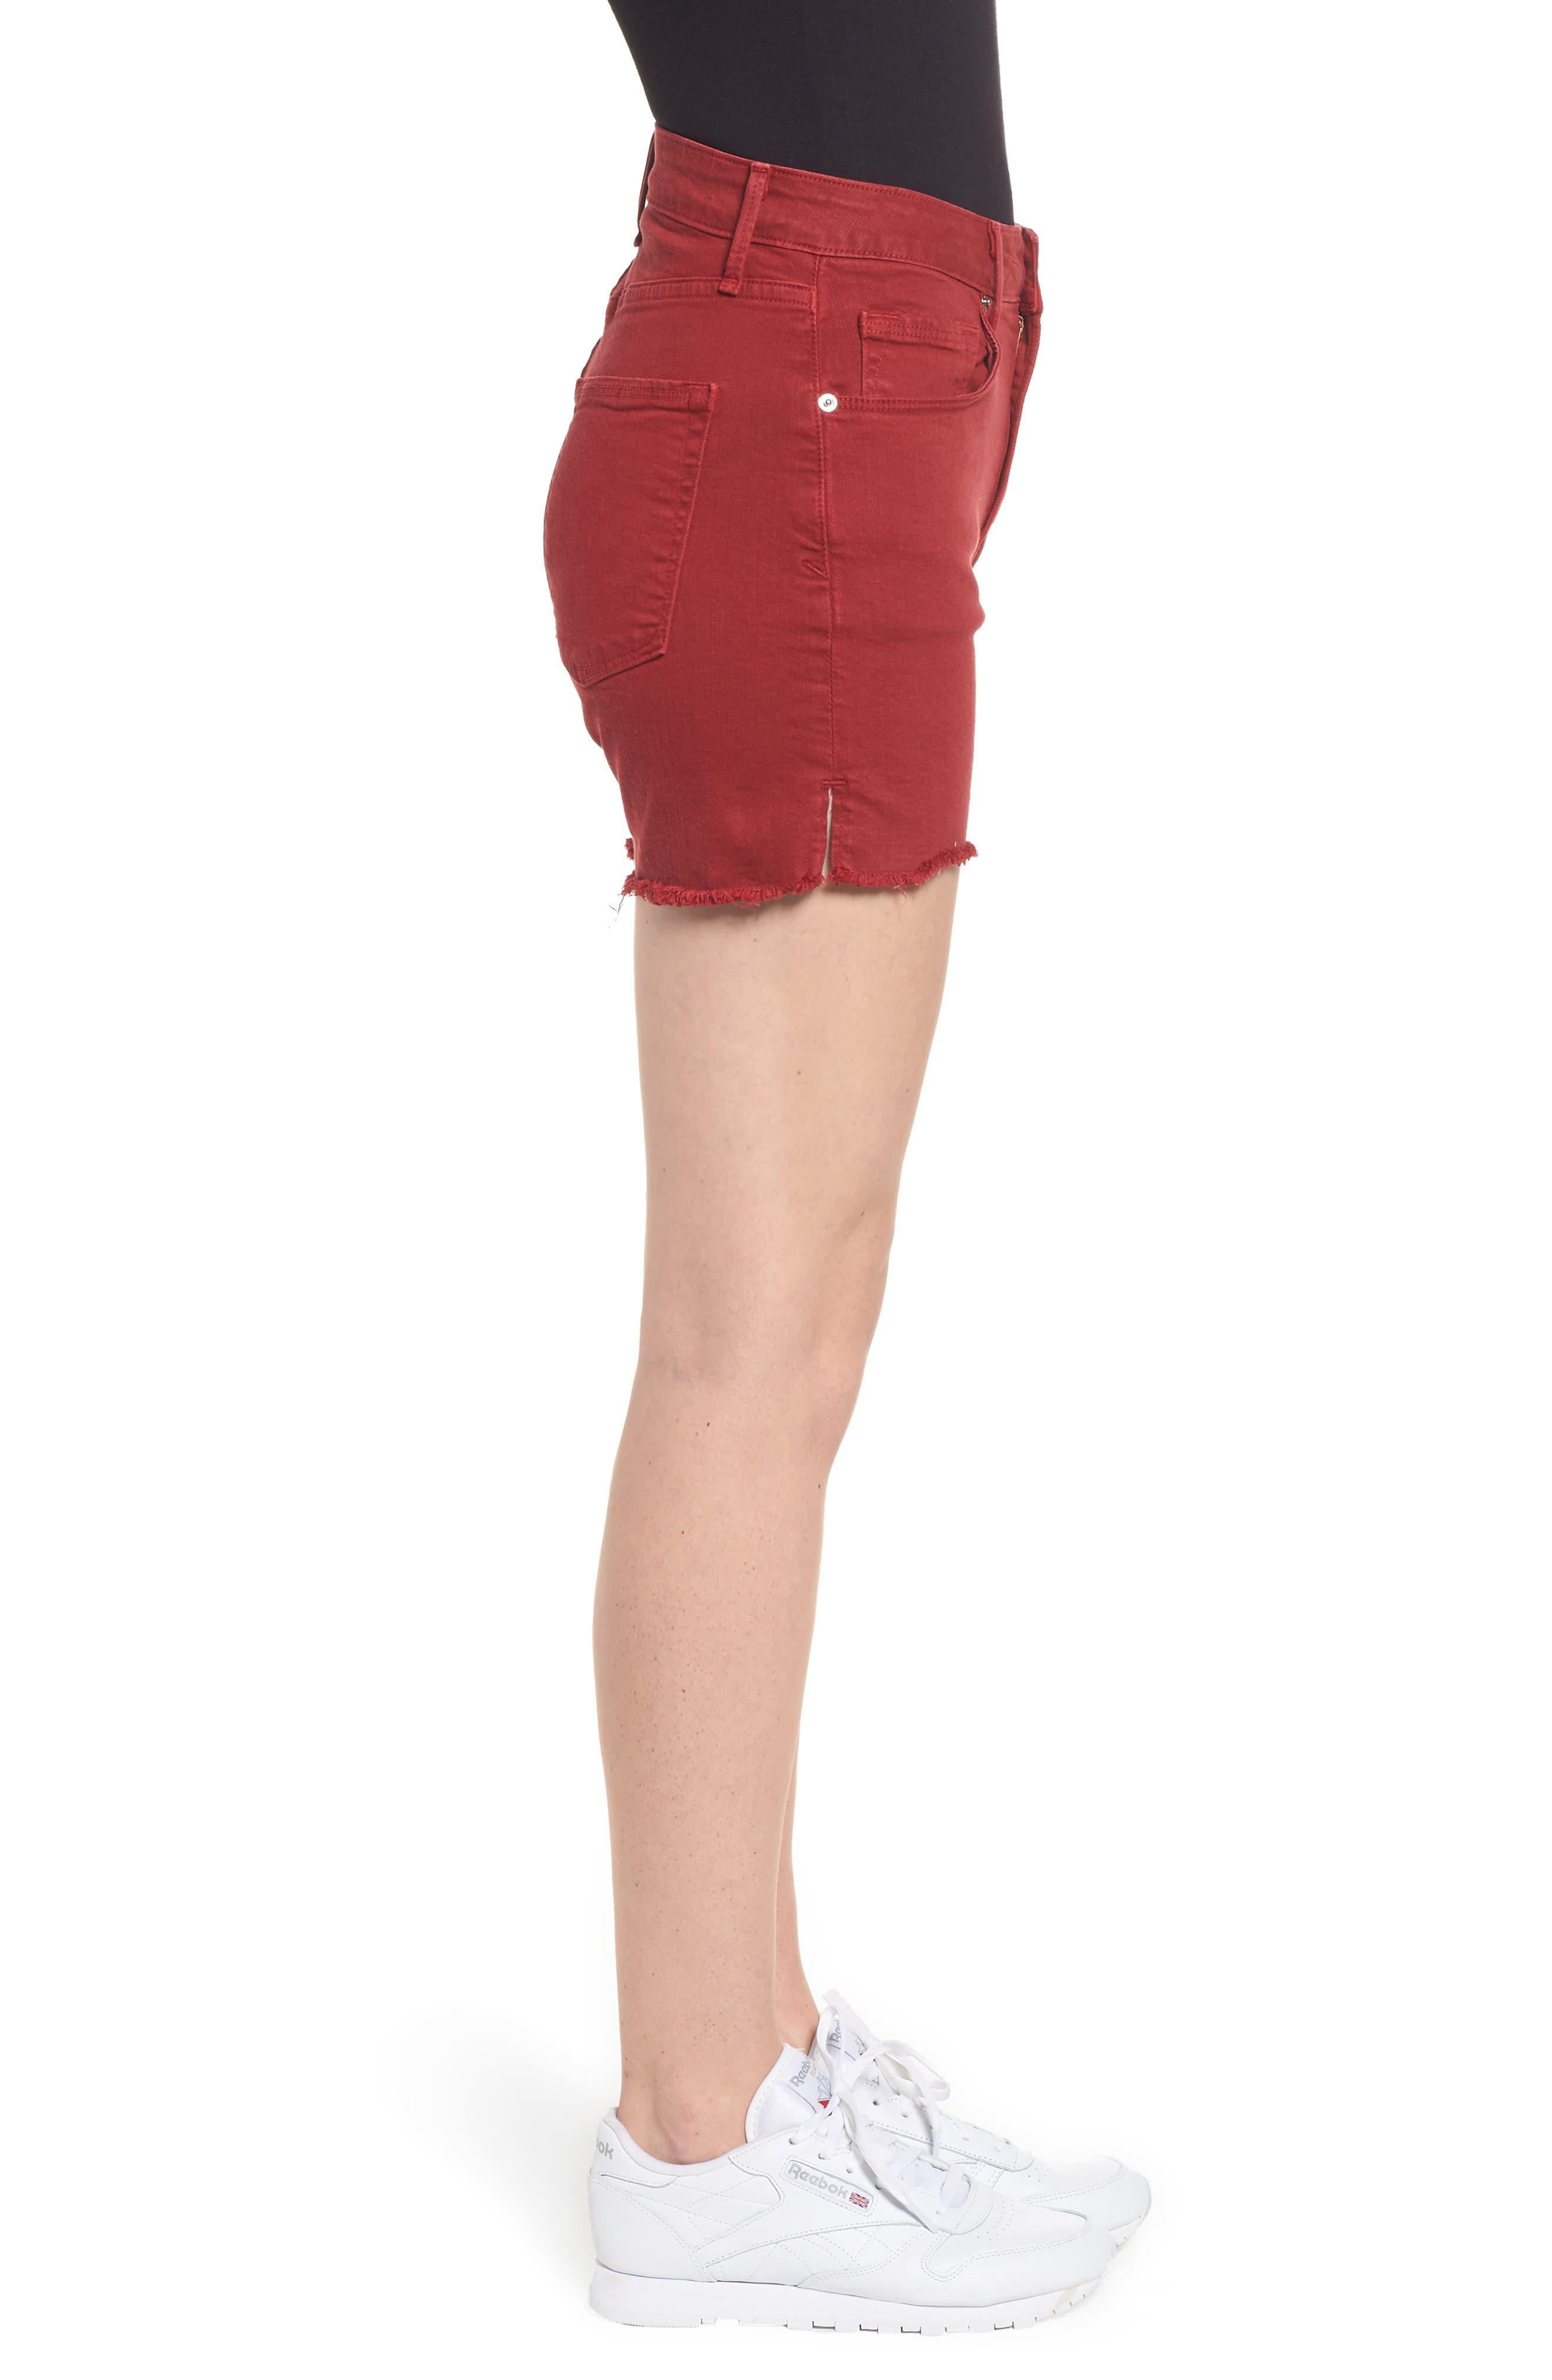 High Waist Cutoff Shorts,                             Alternate thumbnail 3, color,                             Red